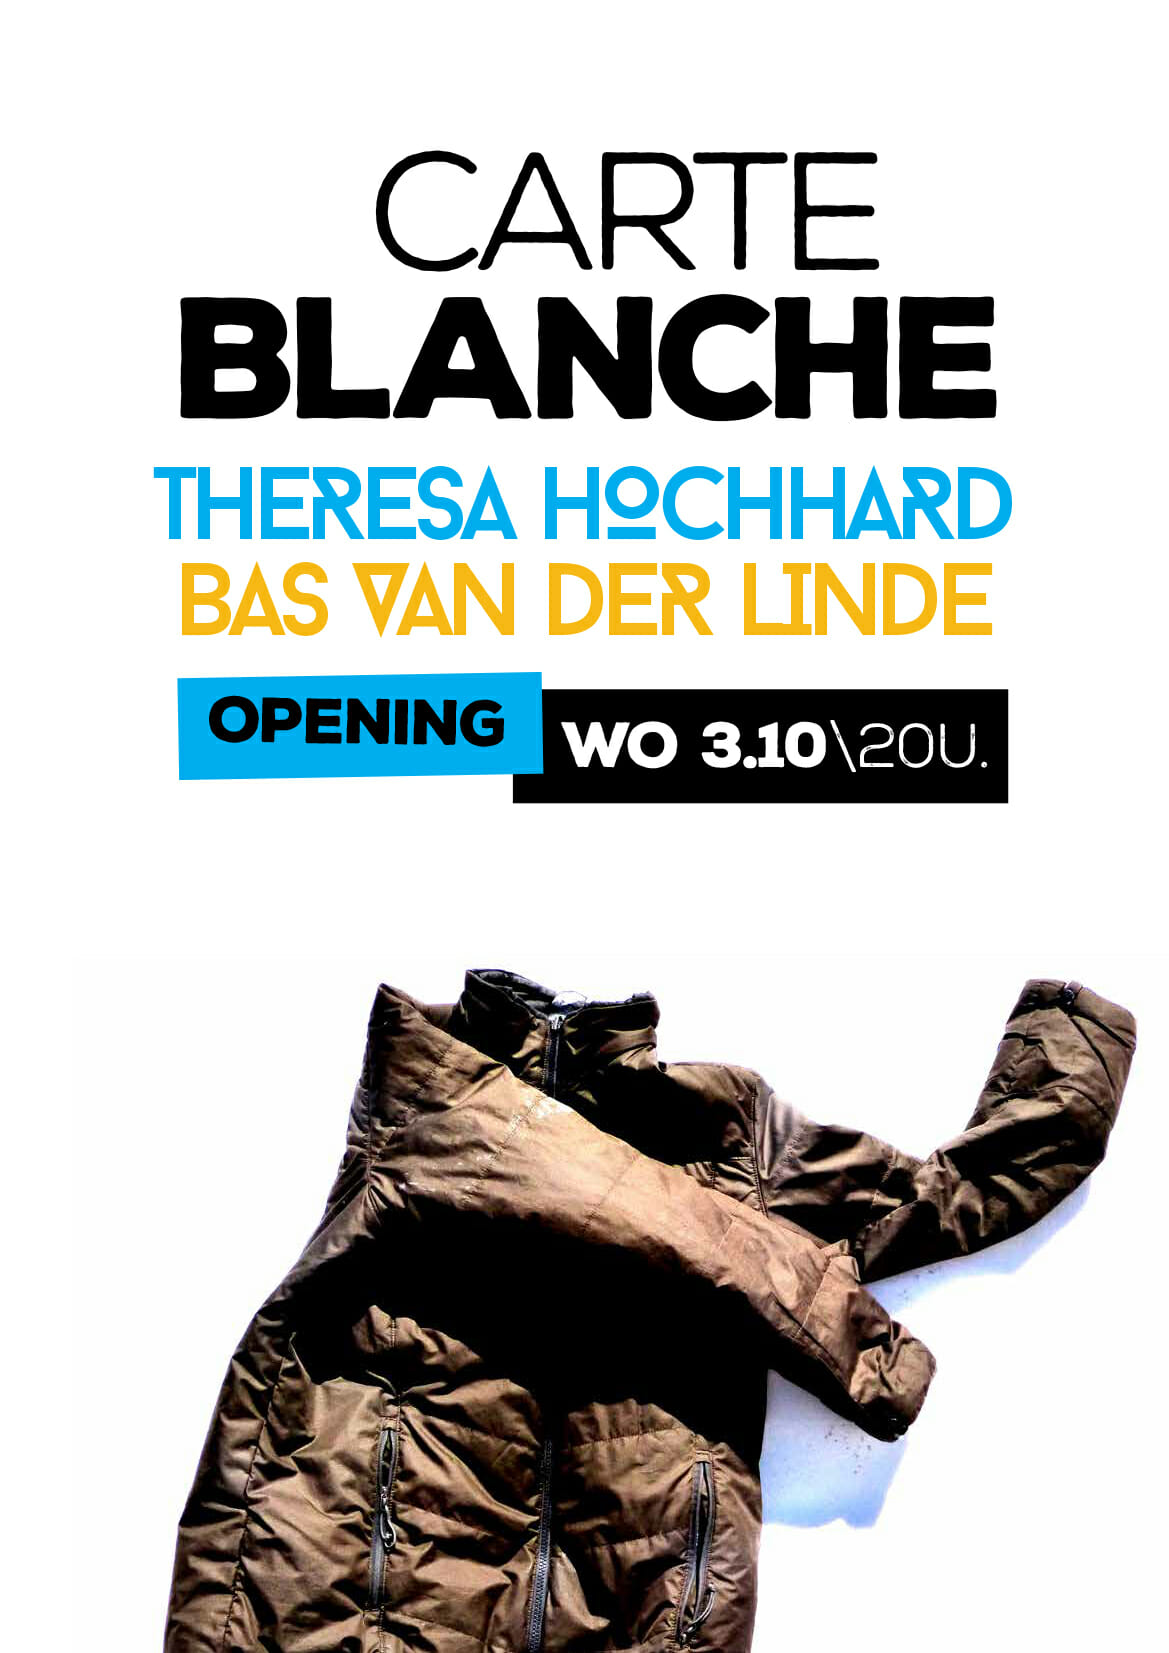 Carte Blanche – Theresa Hochhard & Bas van der Linde